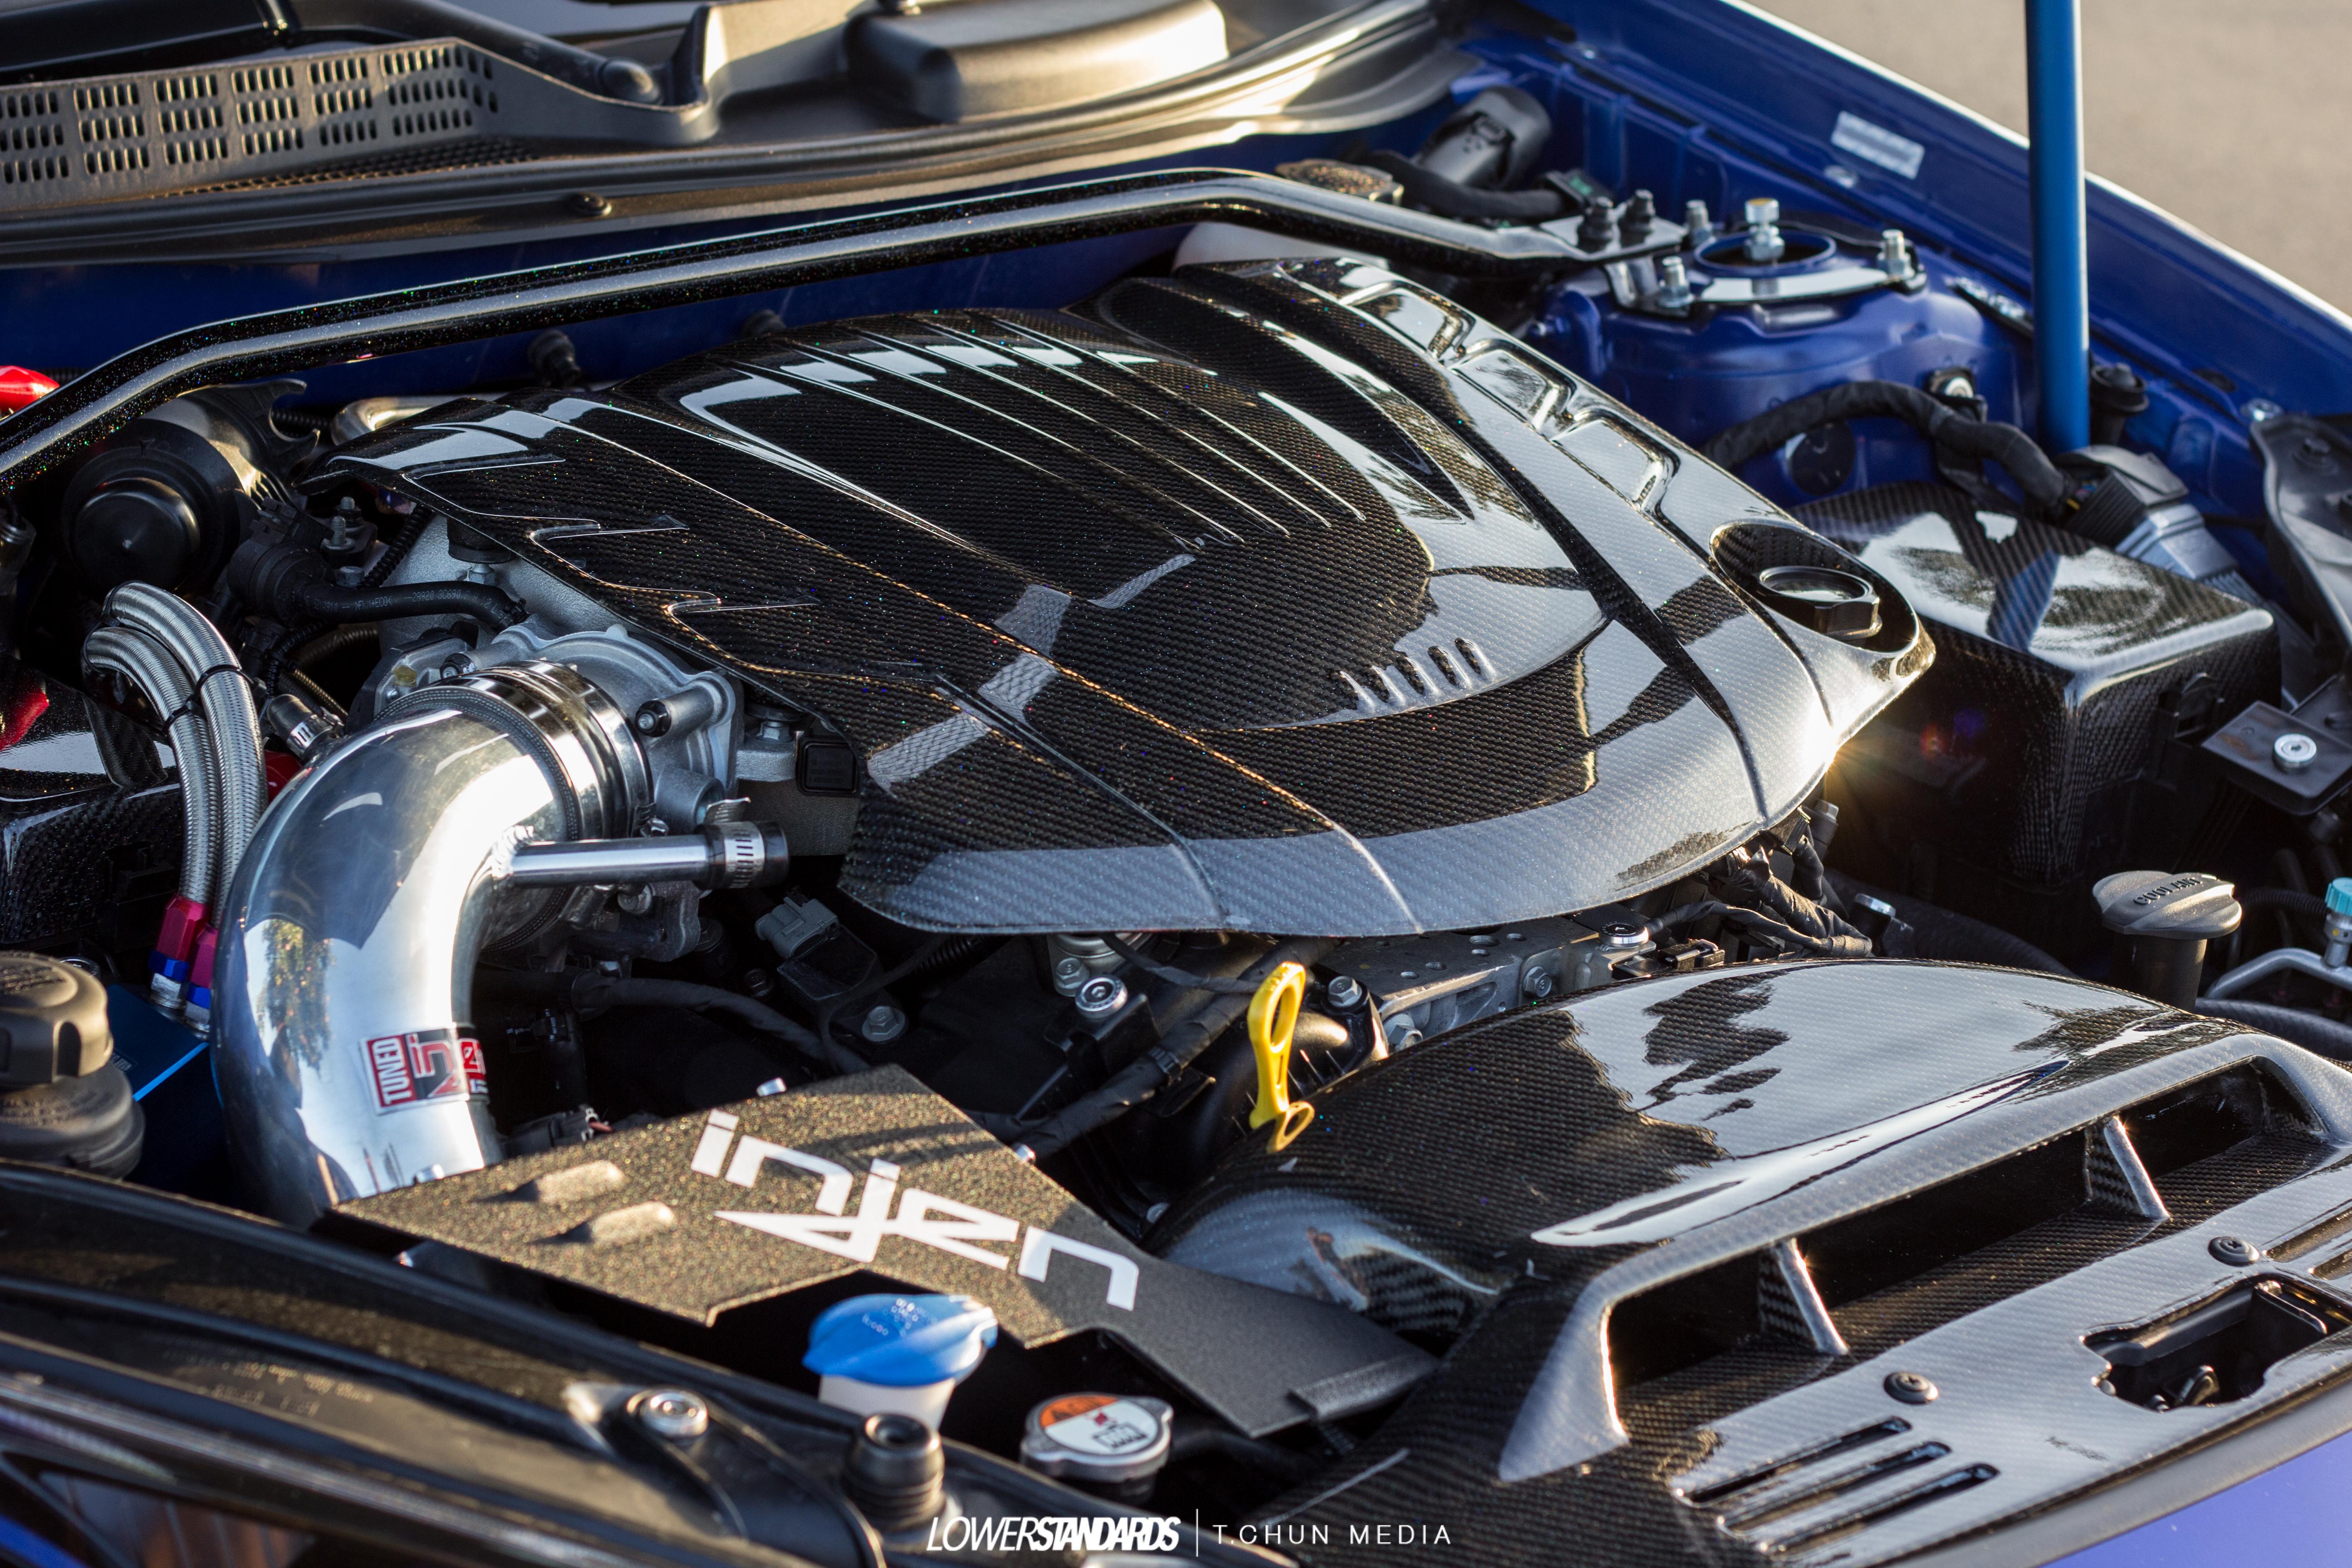 Genesis Auto Parts Sxygen Justin Nishimura39s 2013 Hyundai Genesis Lower